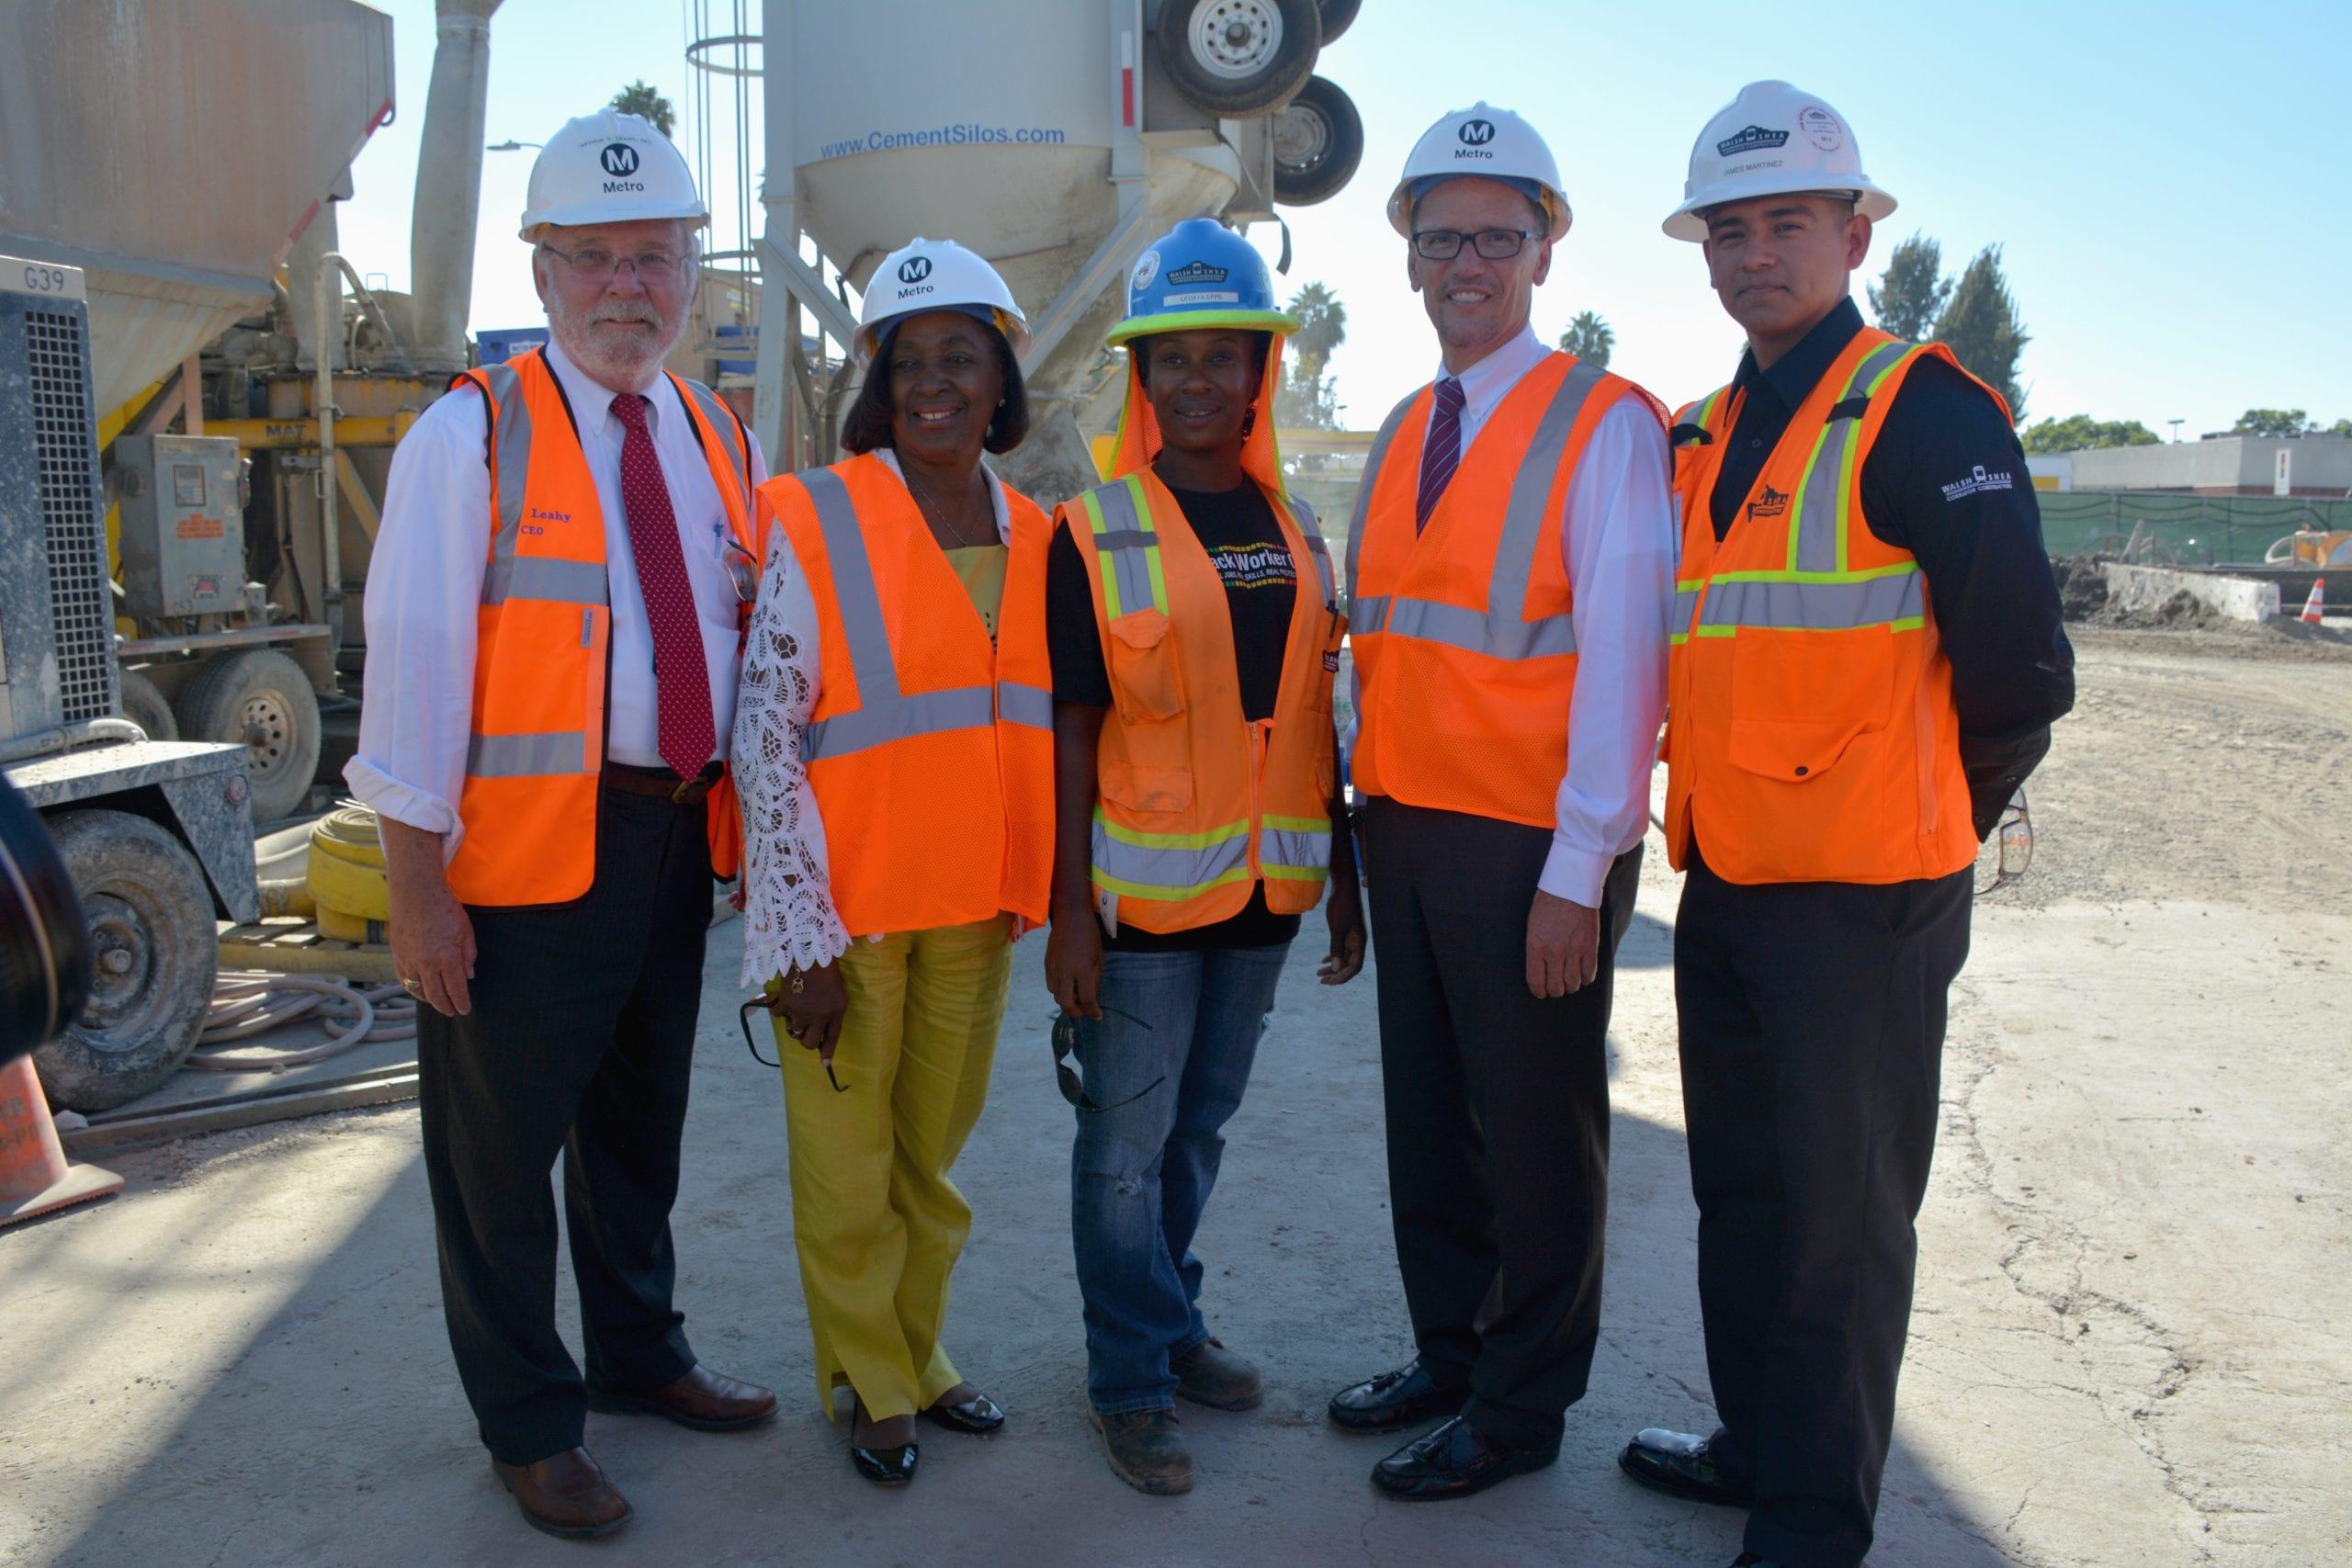 Metro CEO Art Leahy, Metro Board Member Jackie Dupont-Walker, LeDaya Epps, U.S. Labor Secretary Thomas Perez and James Martinez at the Crenshaw/Expo Yard. photo Luis Inzunza/Metro.